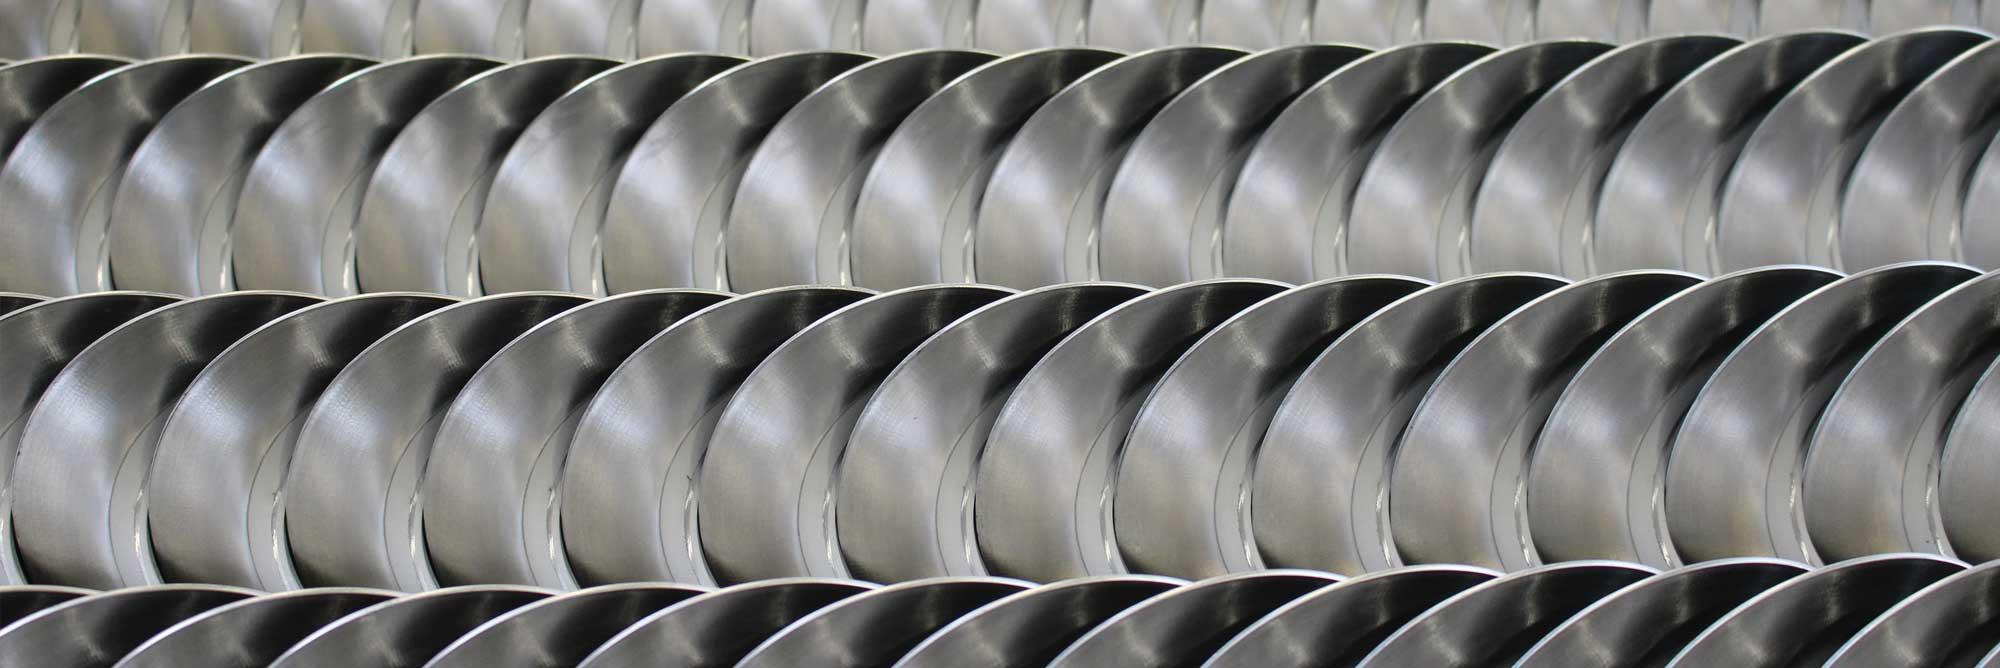 Spirali speciali per stufe e caldaie a pellet e cippato_gallery_03